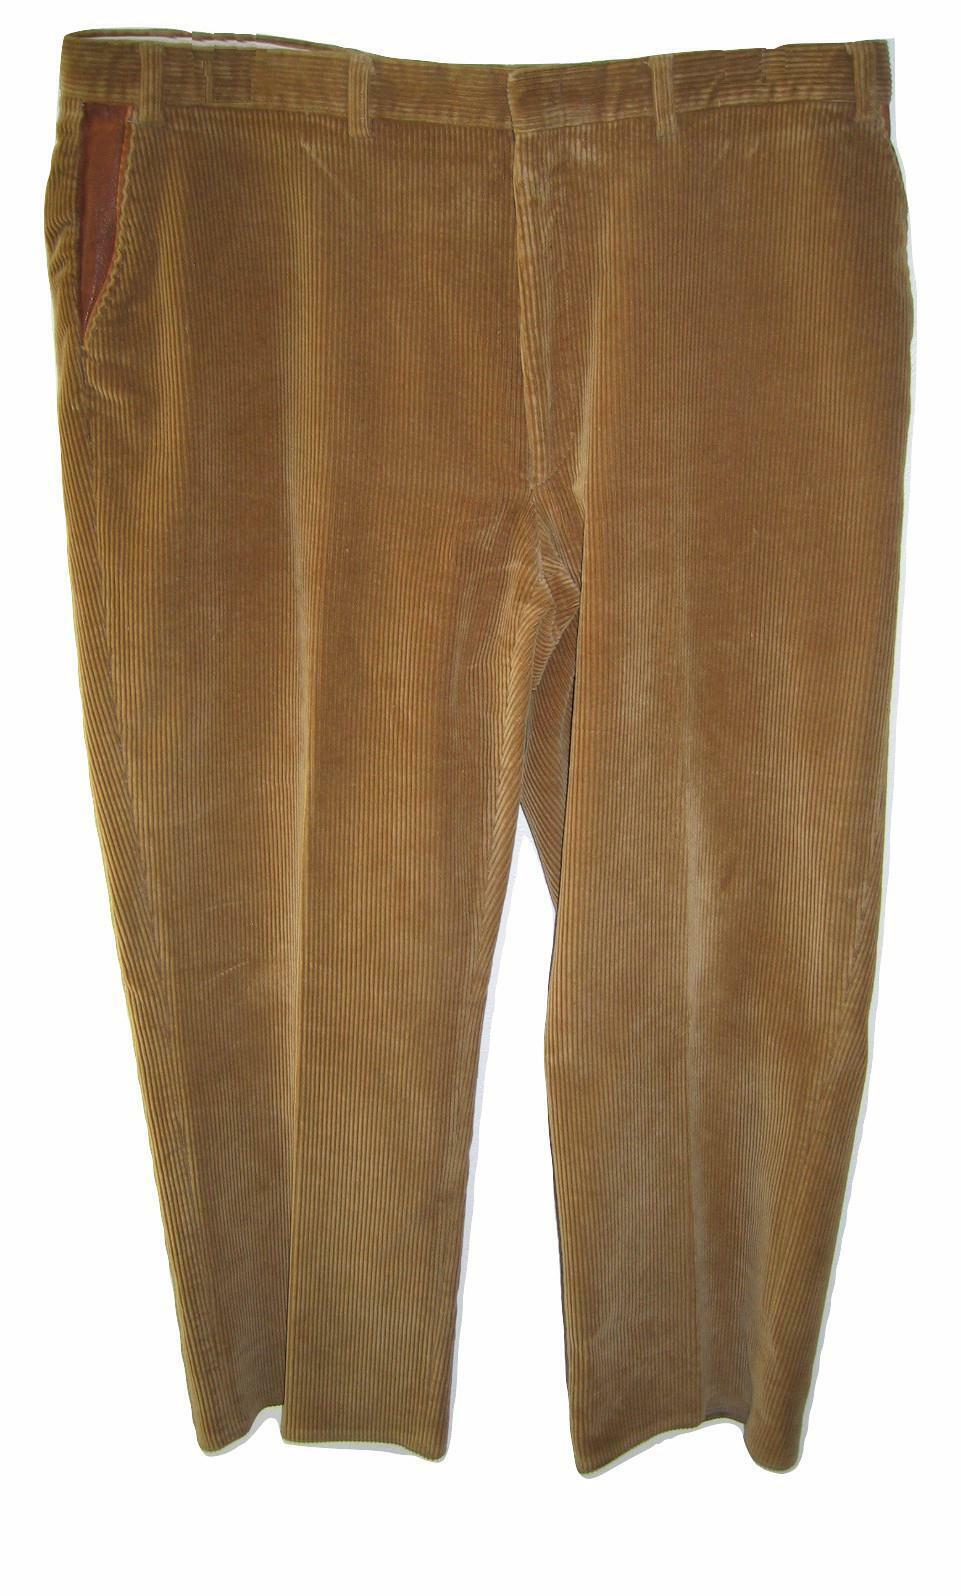 Mens ORVIS Corduroy Pants 41 Waist 27.5 Inseam Leather Trim Flat Front Tan